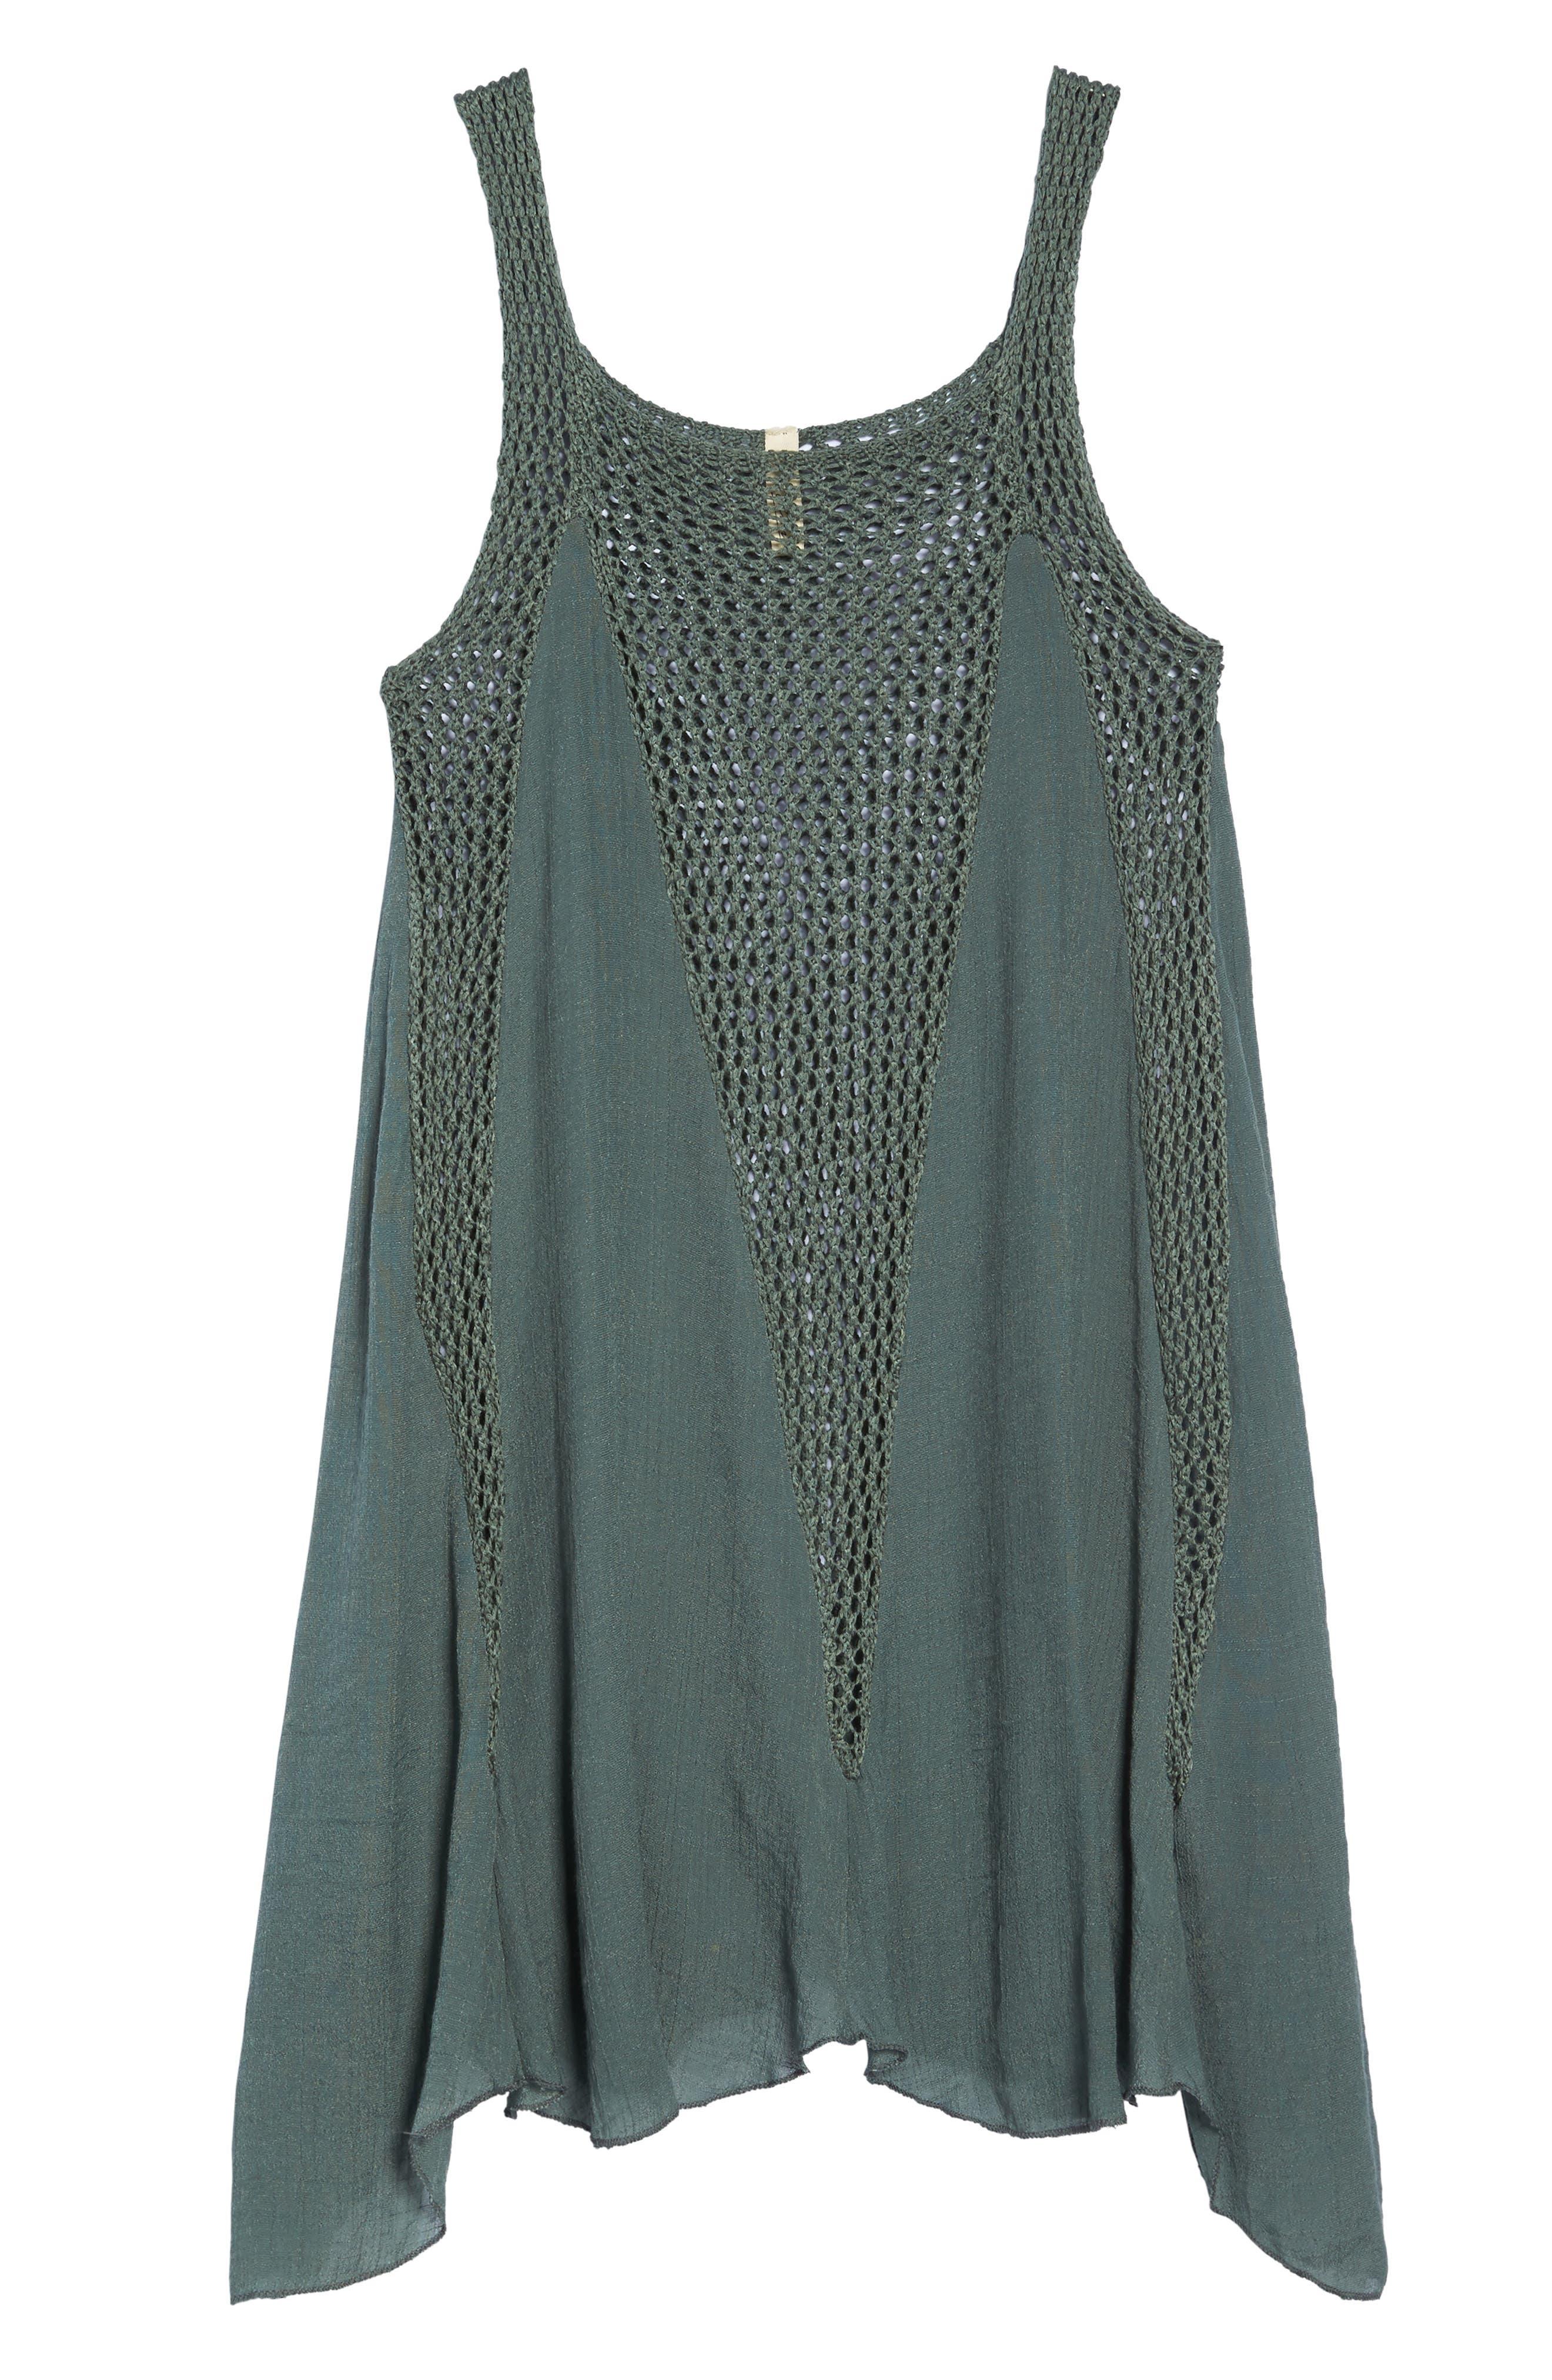 Crochet Inset Cover-Up Dress,                             Alternate thumbnail 6, color,                             302